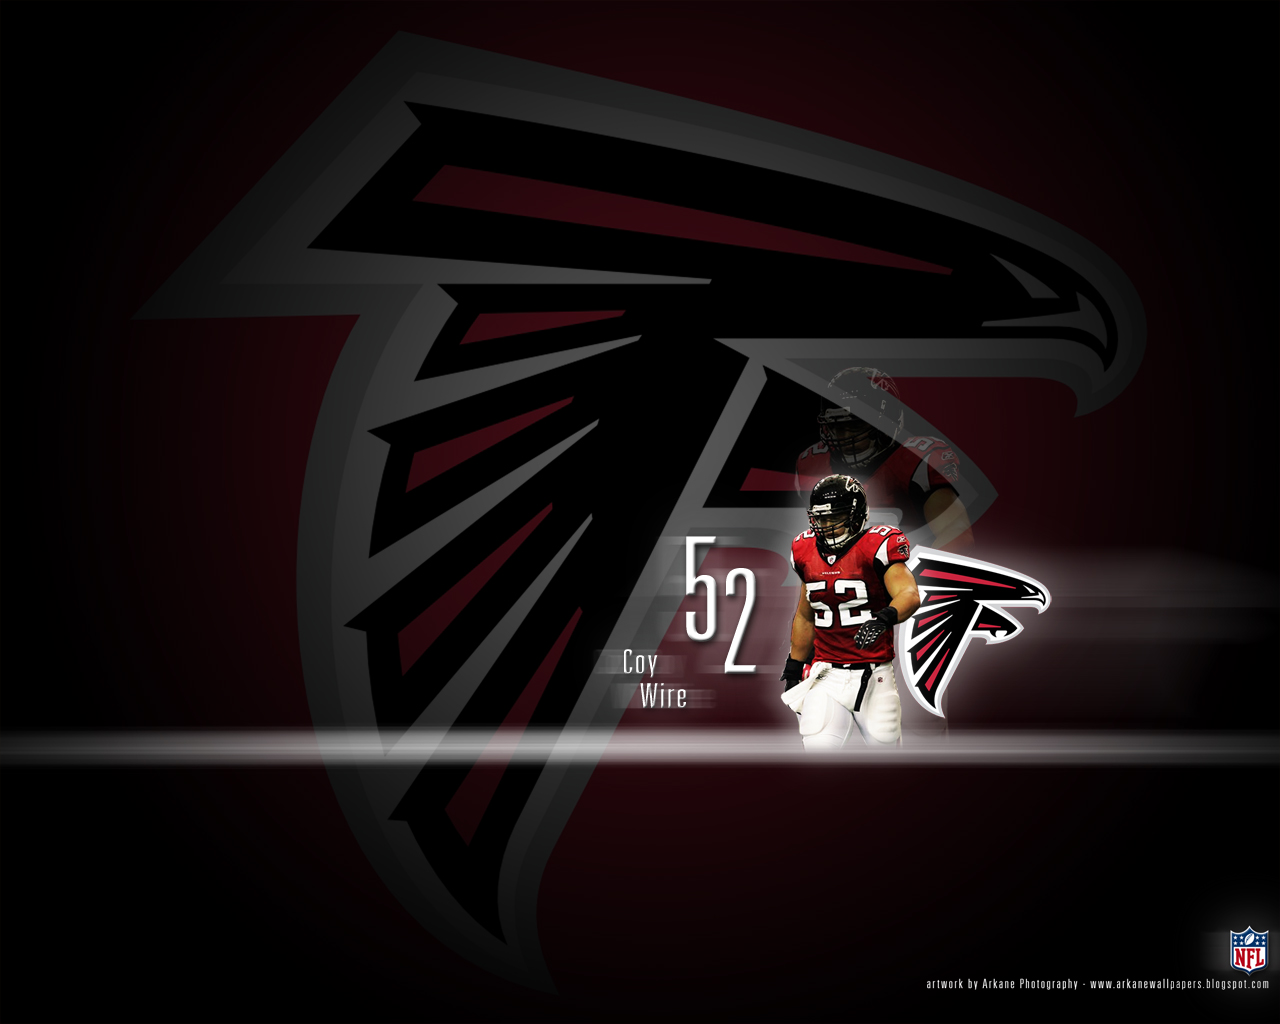 http://3.bp.blogspot.com/_JuYYGgmnUQU/SwGDJRECVVI/AAAAAAAAAS0/TrfI0Bh5zZc/s1600/52+Coy+Wire+-+Falcons.jpeg